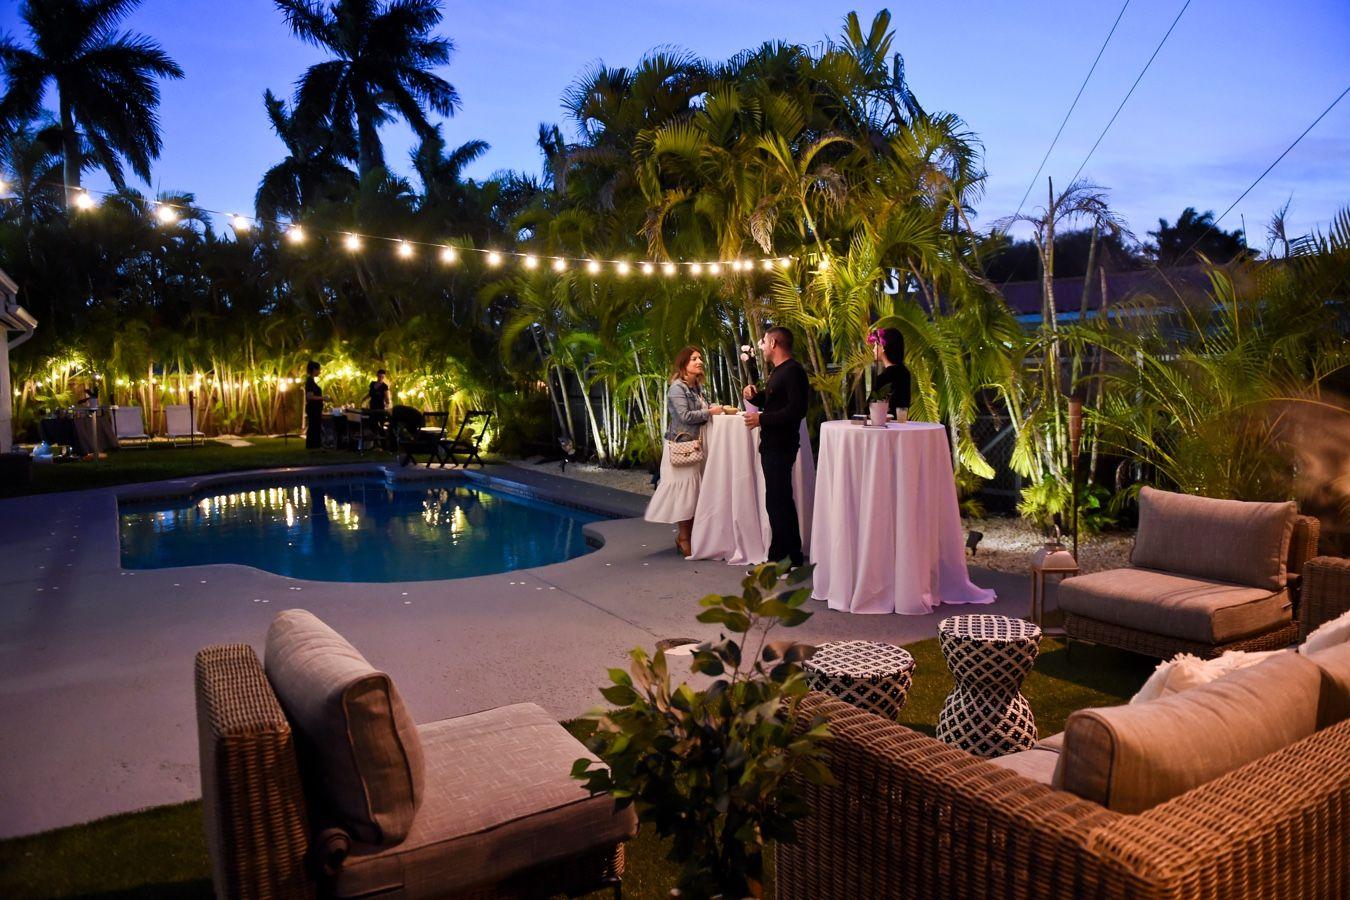 Weekend Highlights: Our New Florida Neighborhood Showroom Parties